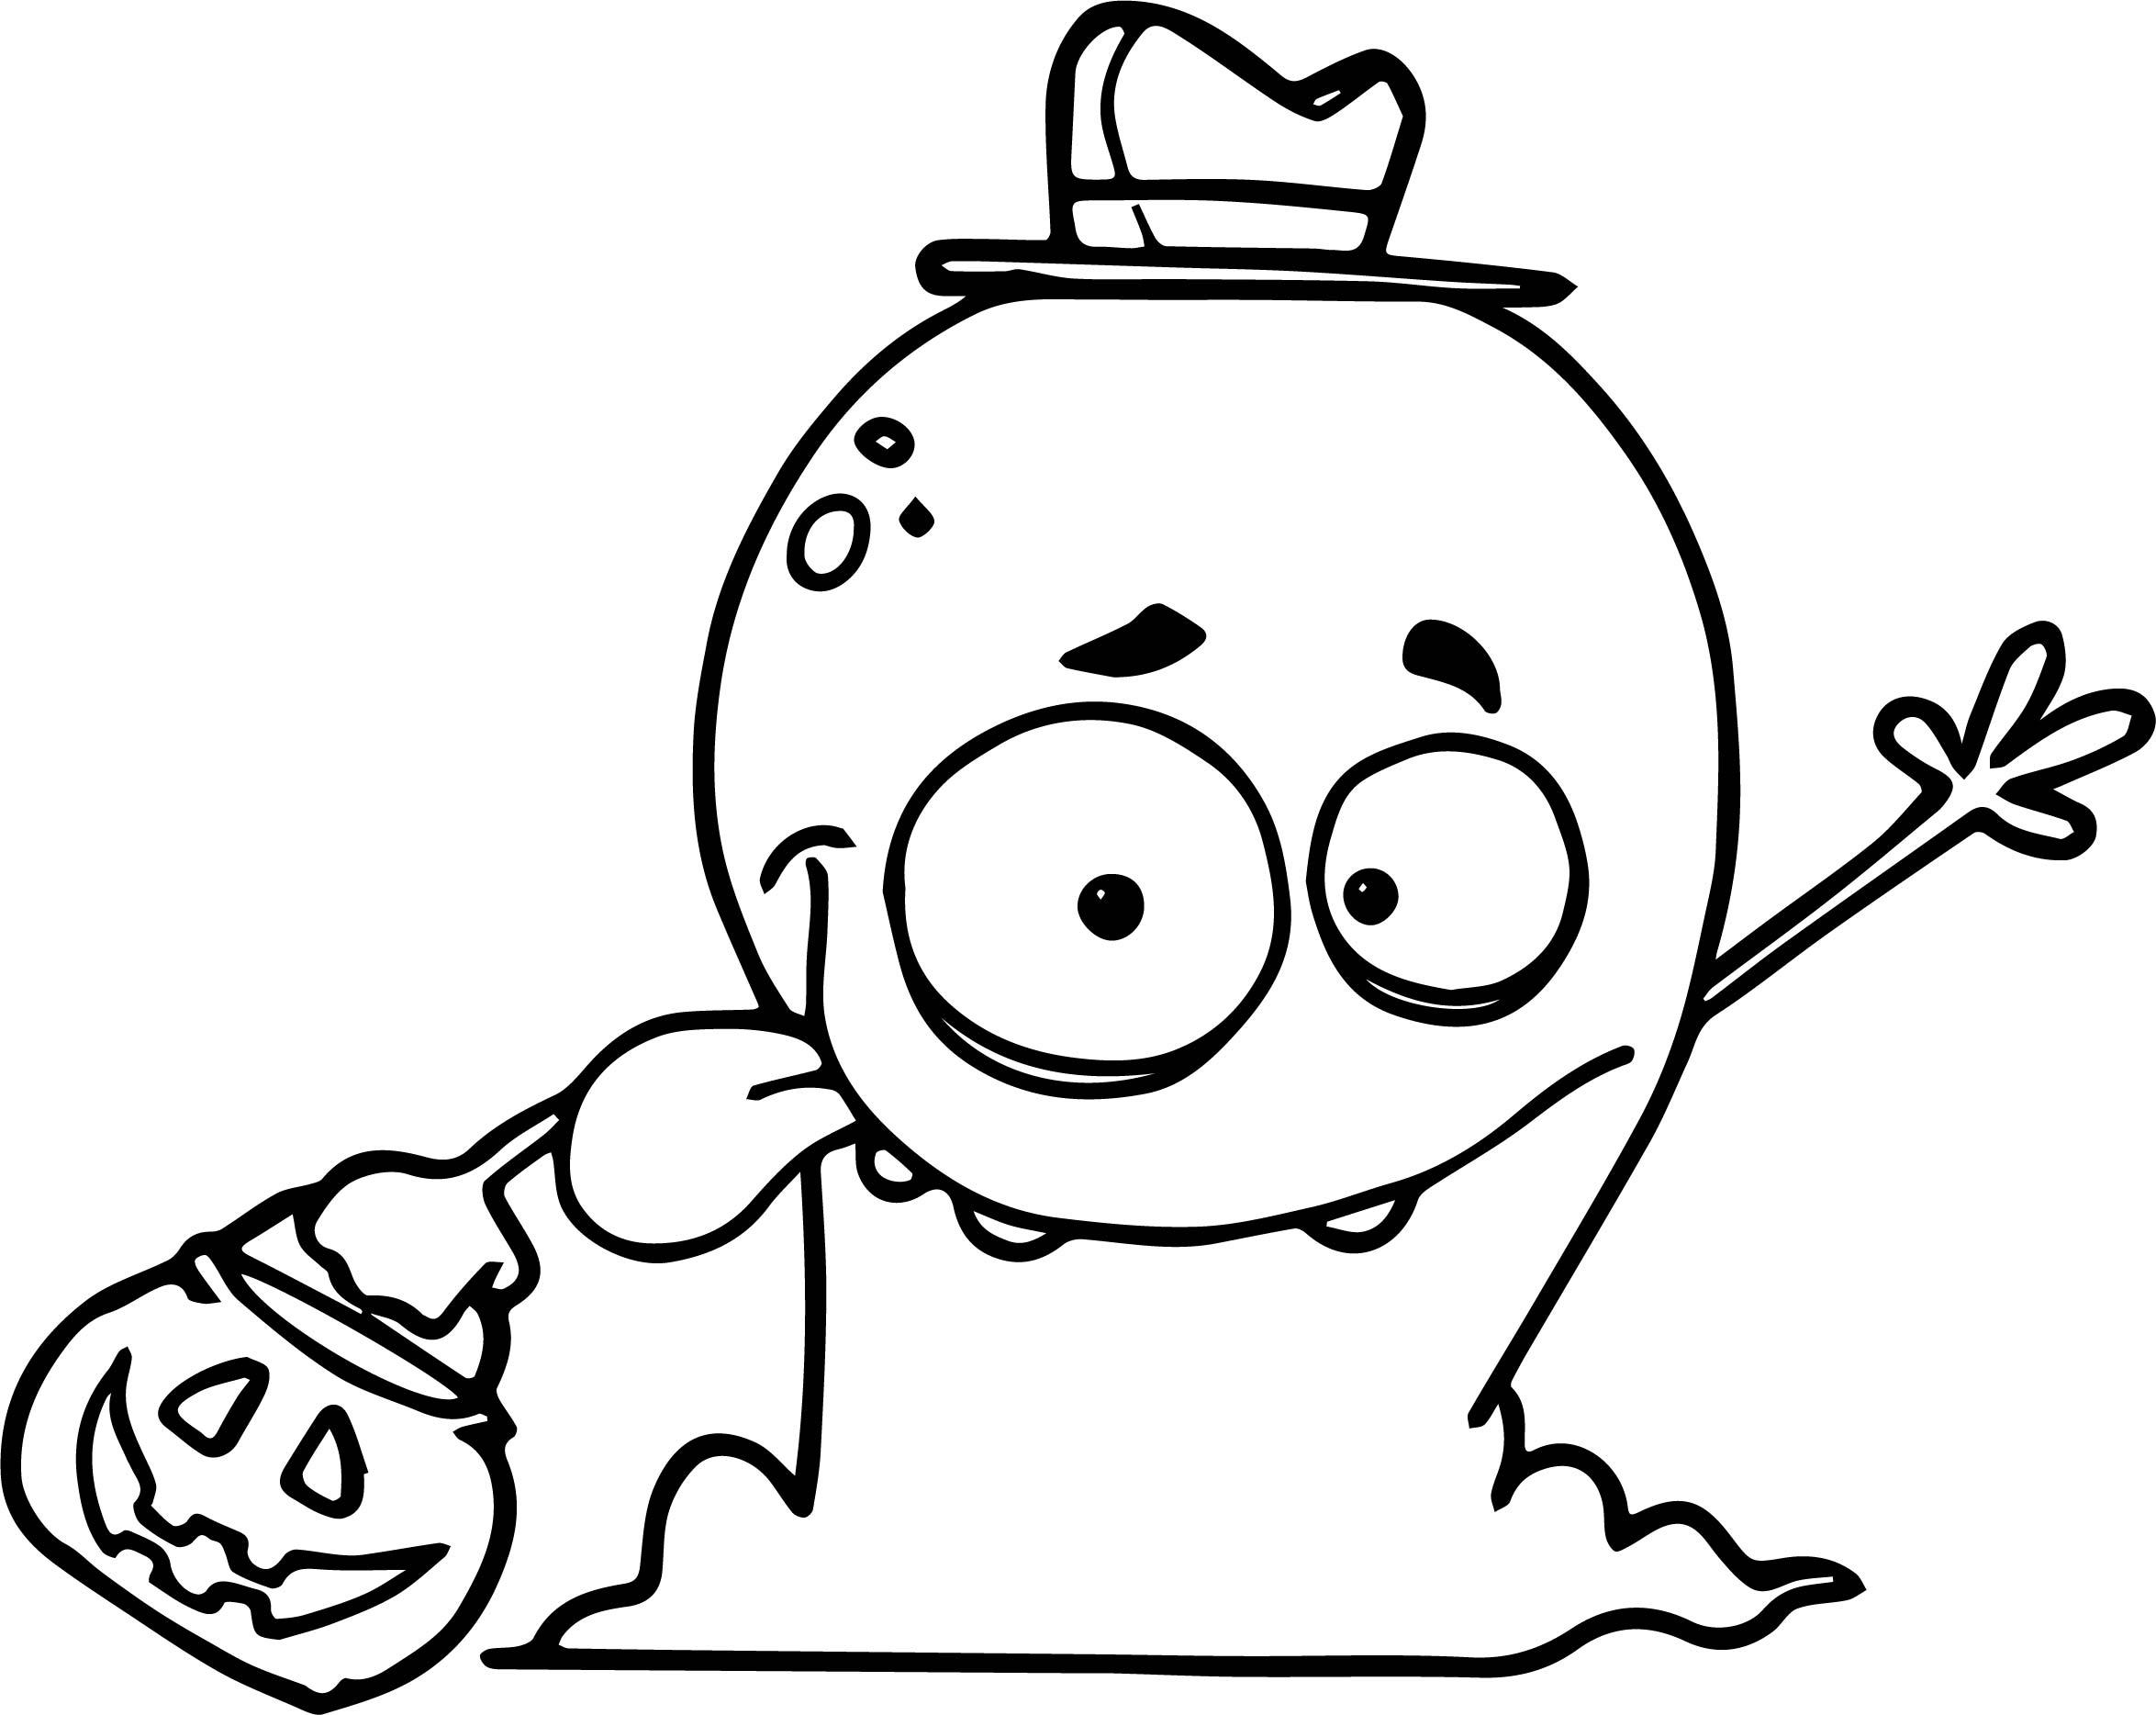 Friendly Alien Monster Trick Or Treating On Halloween